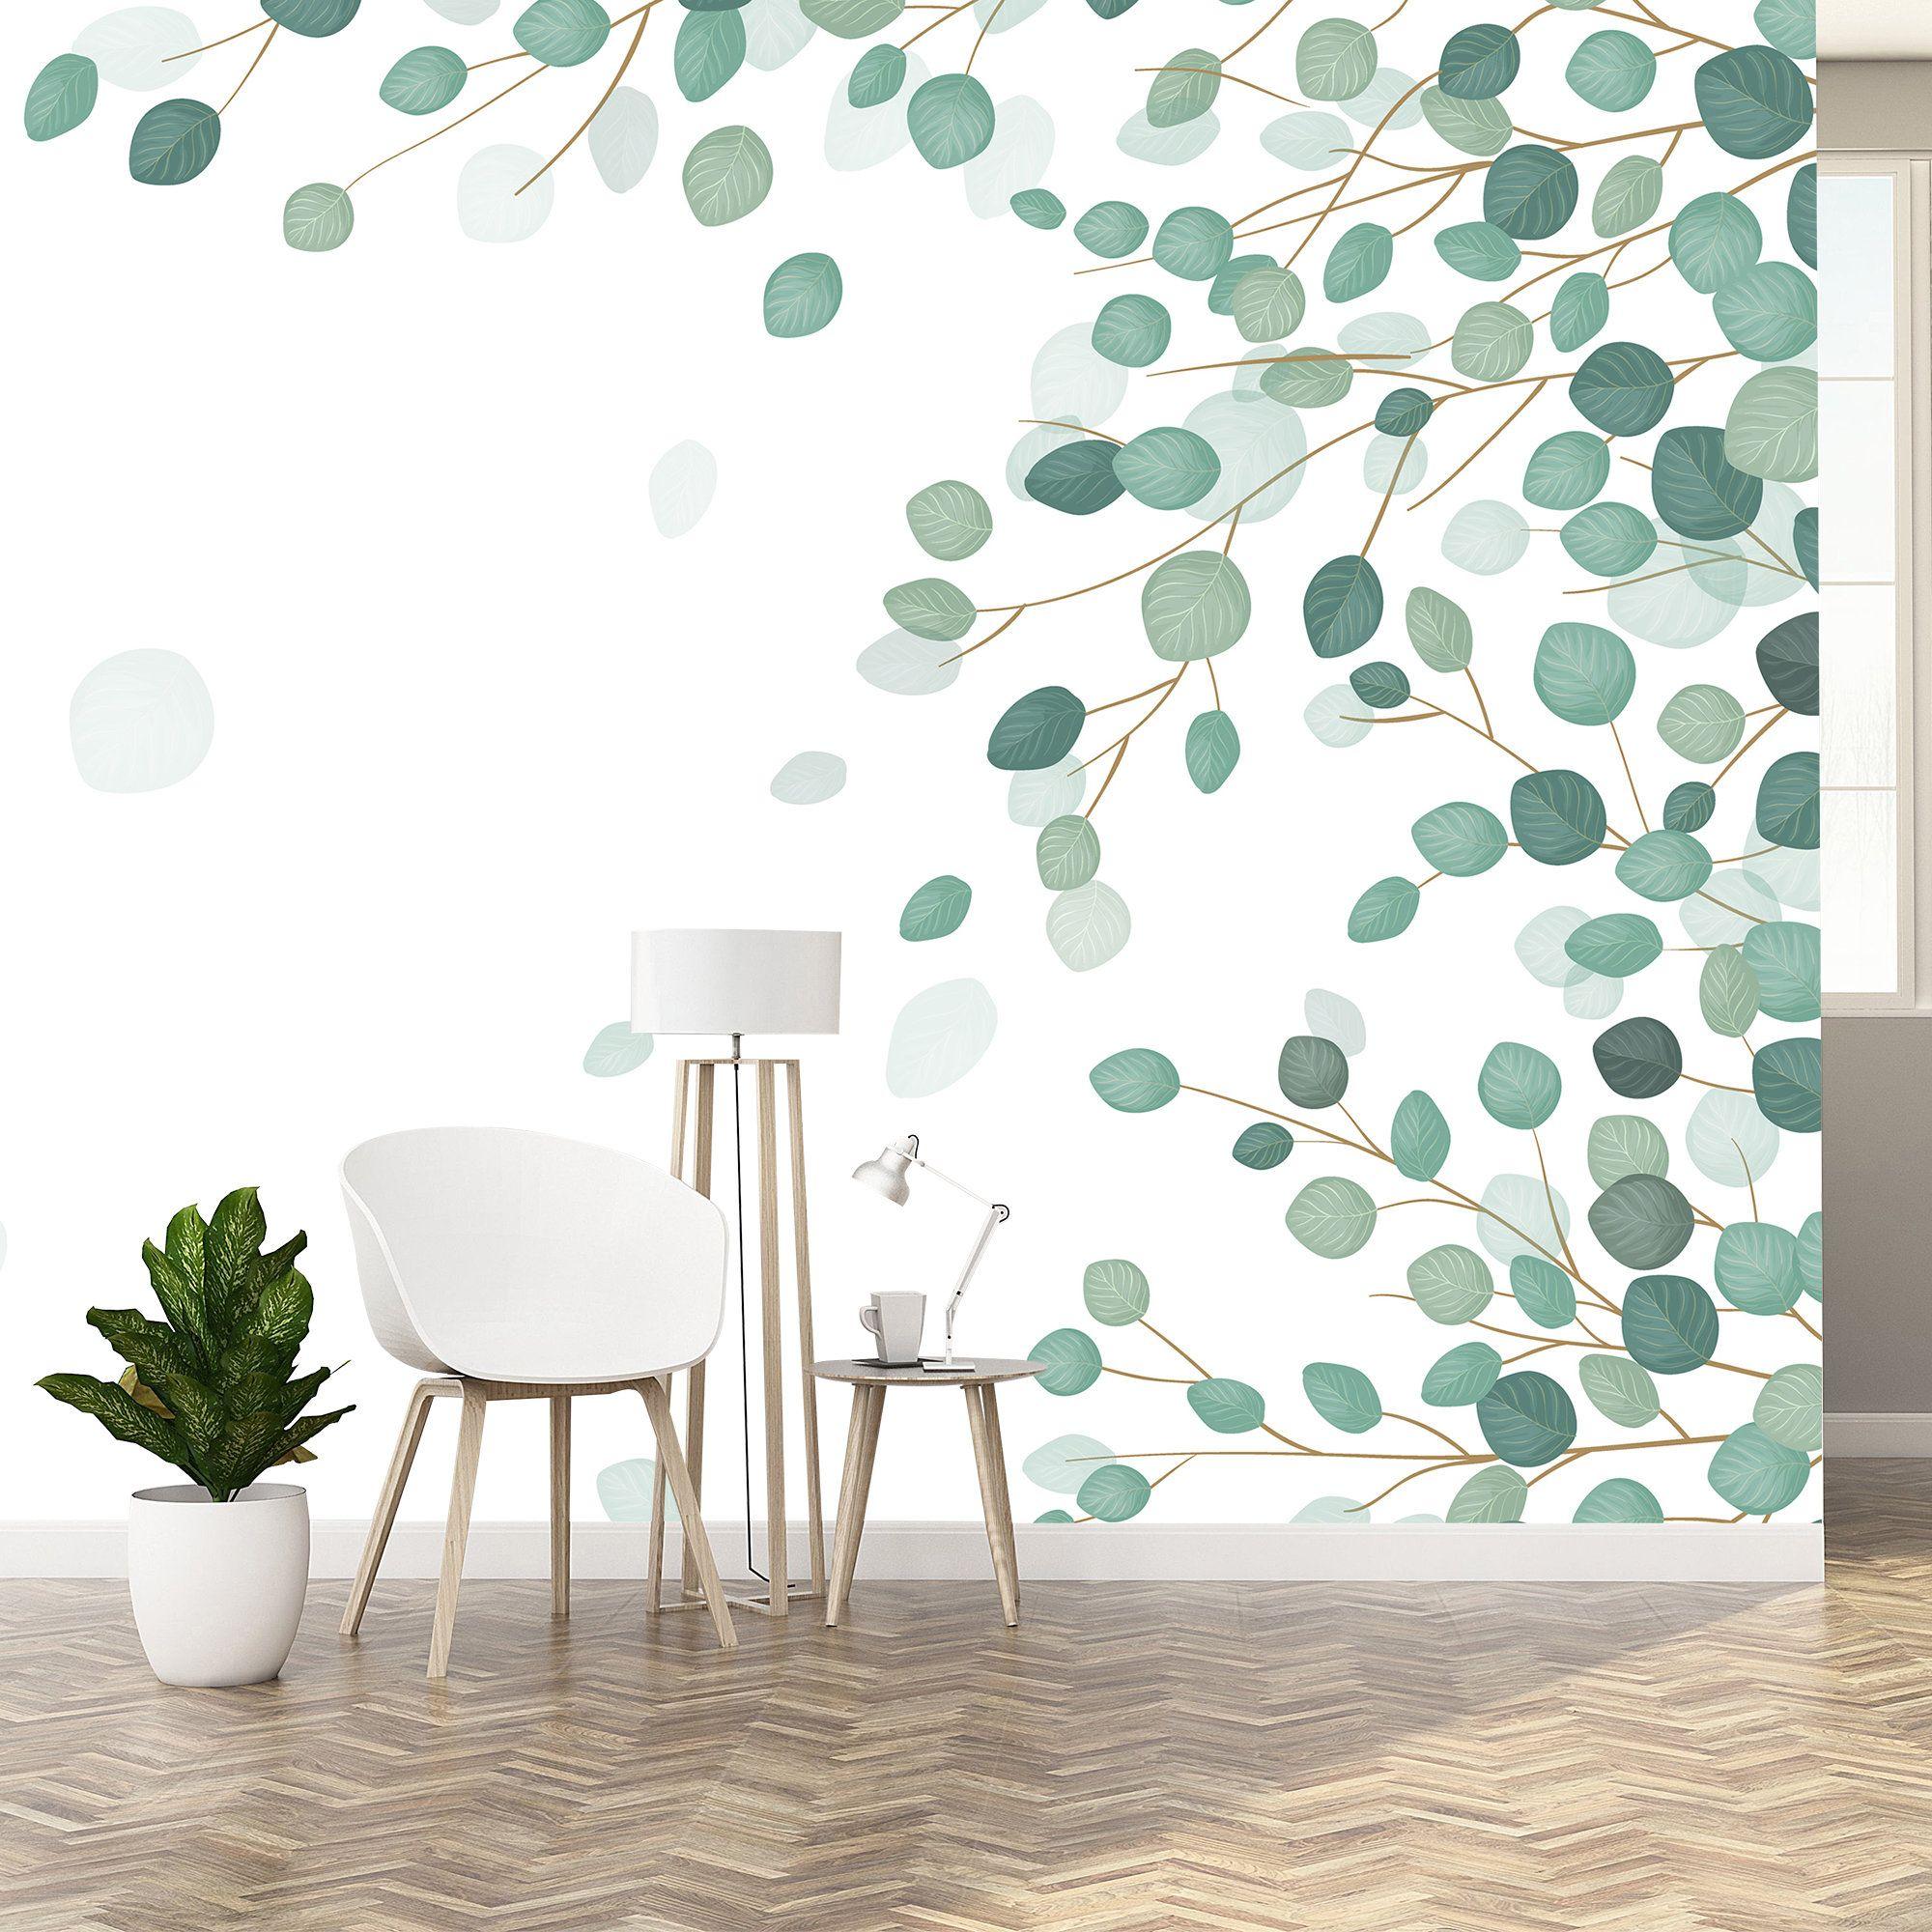 Eucalyptus Leaf Wallpaper Removable Wallpaper Leaf Wall Mural Peel Stick Made In Europe Self Adhesive Non Toxic 18 Leaf Wallpaper Removable Wallpaper Wallpaper Walls Decor